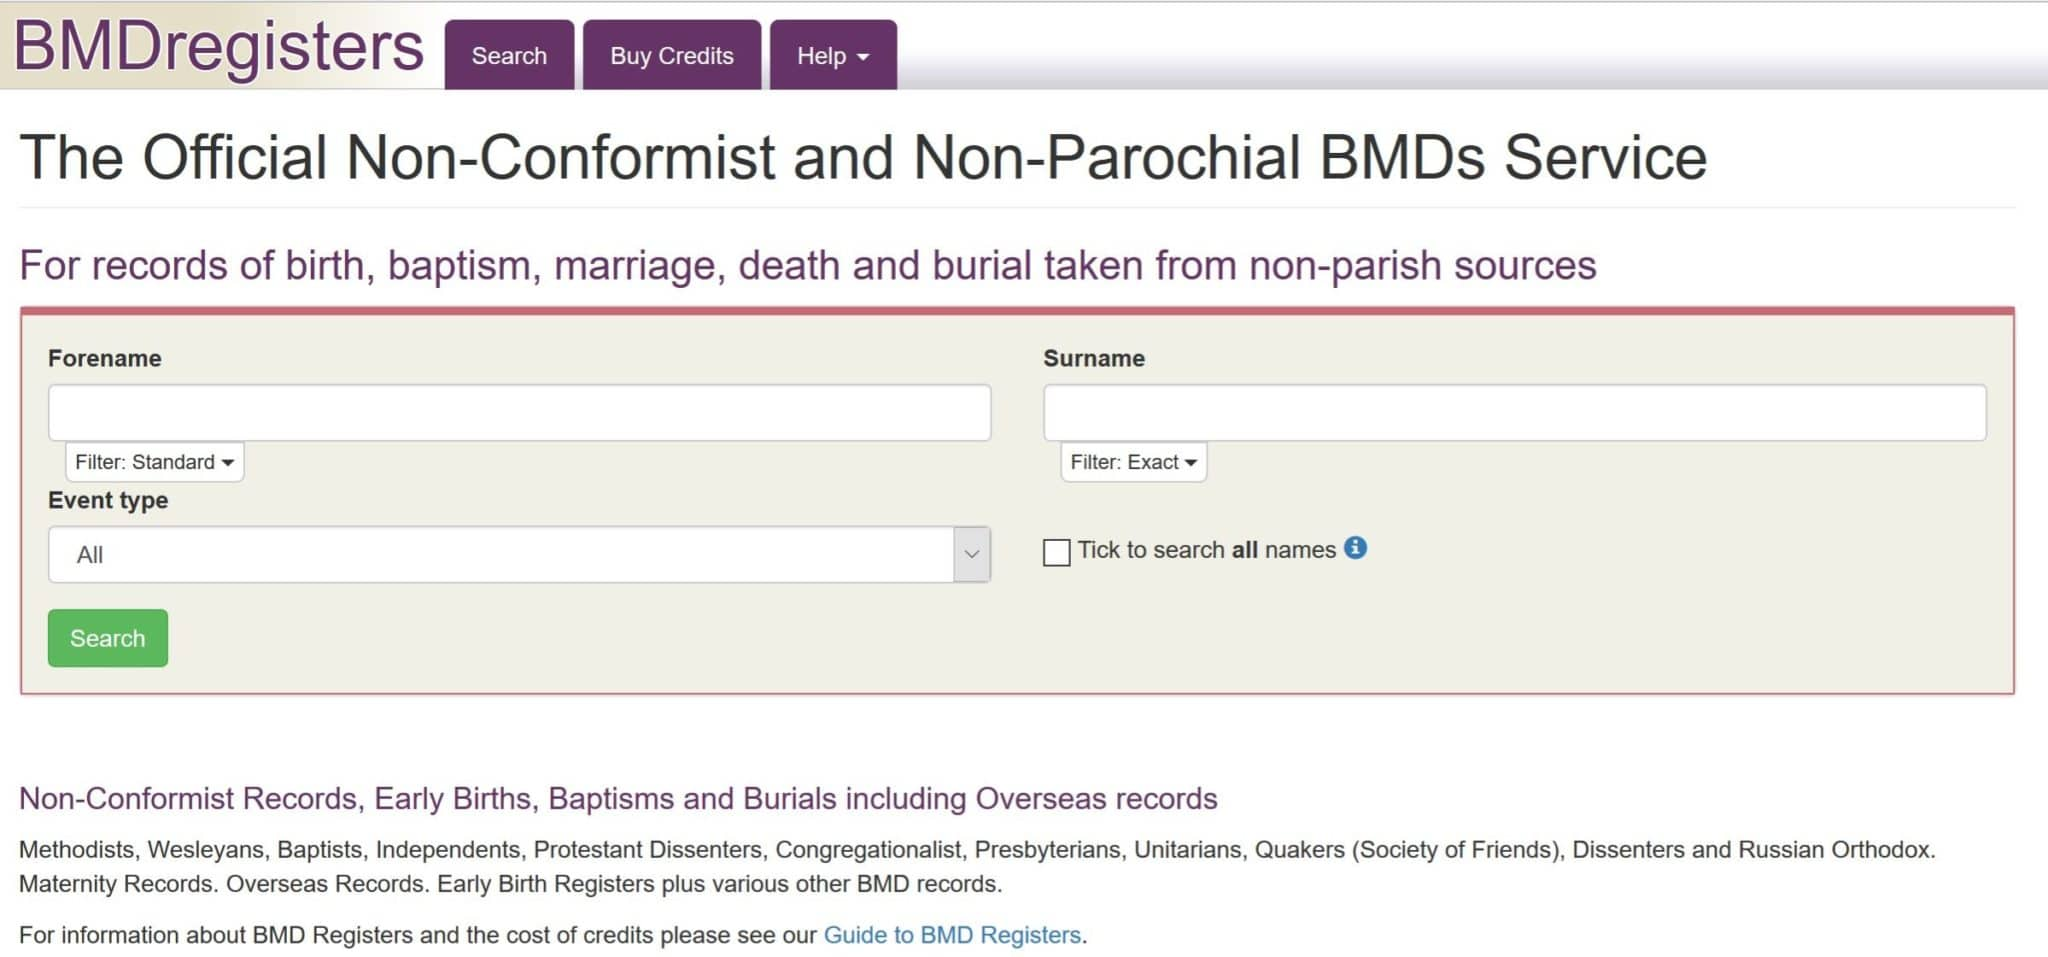 British, Irish, Scottish, Welsh Genealogy Research Guide, BMDRegisters non-comformist records